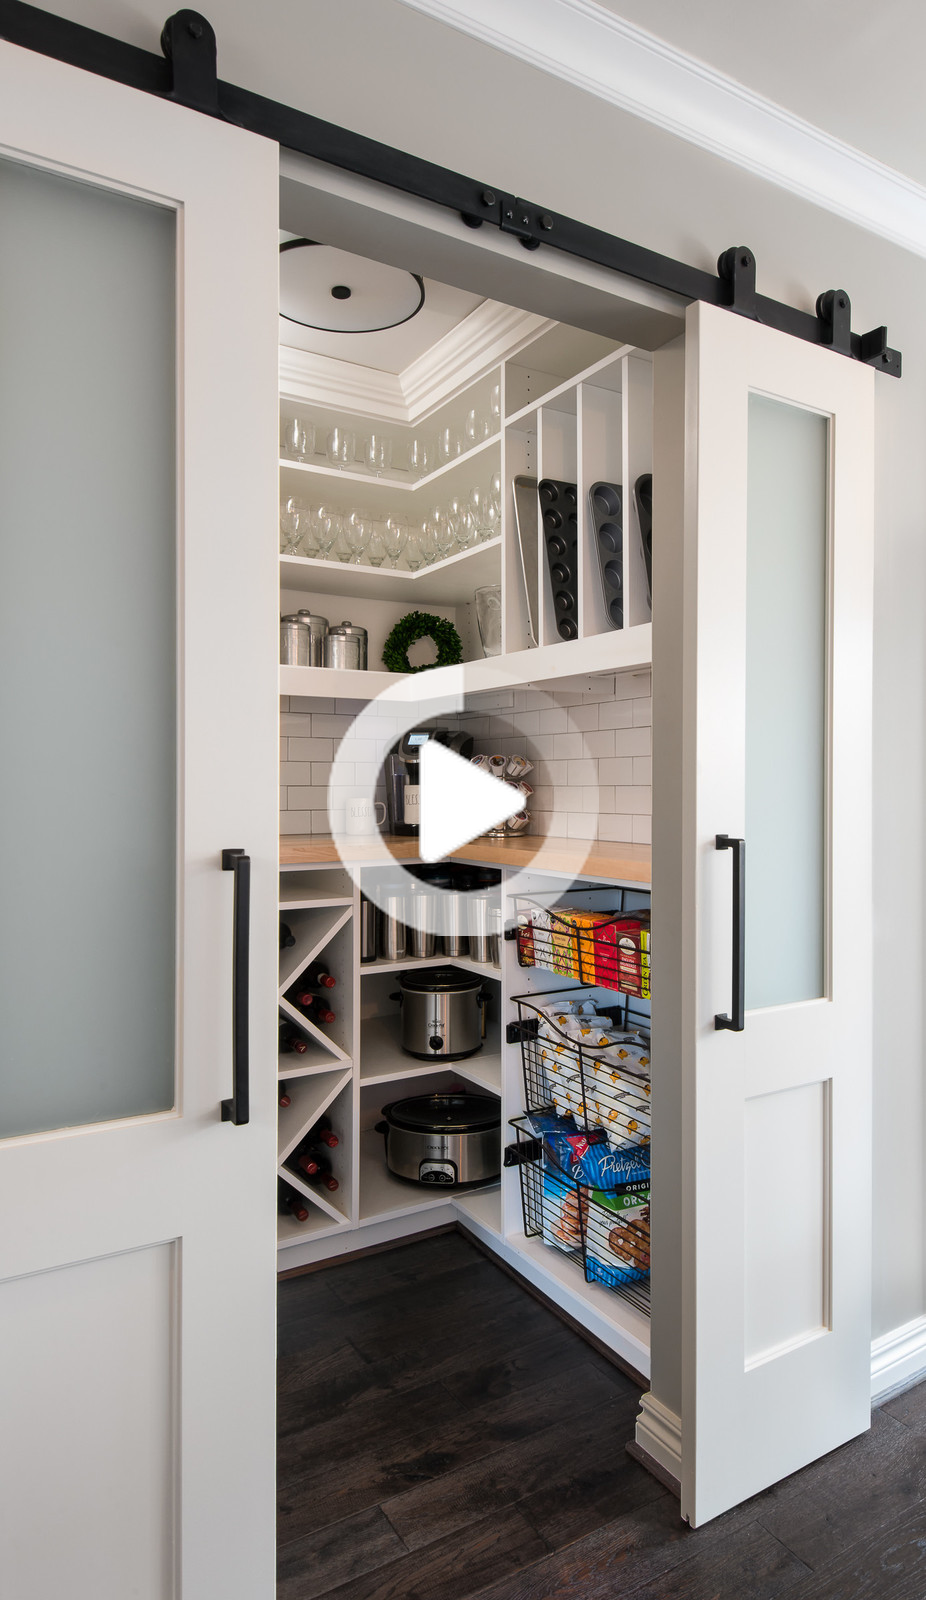 Barn Door Cabina Pantry Transitional Rimodellare Cucina Transitional Cucina Detroit Da Mainstreet Design Build Cucinadiluna In 2020